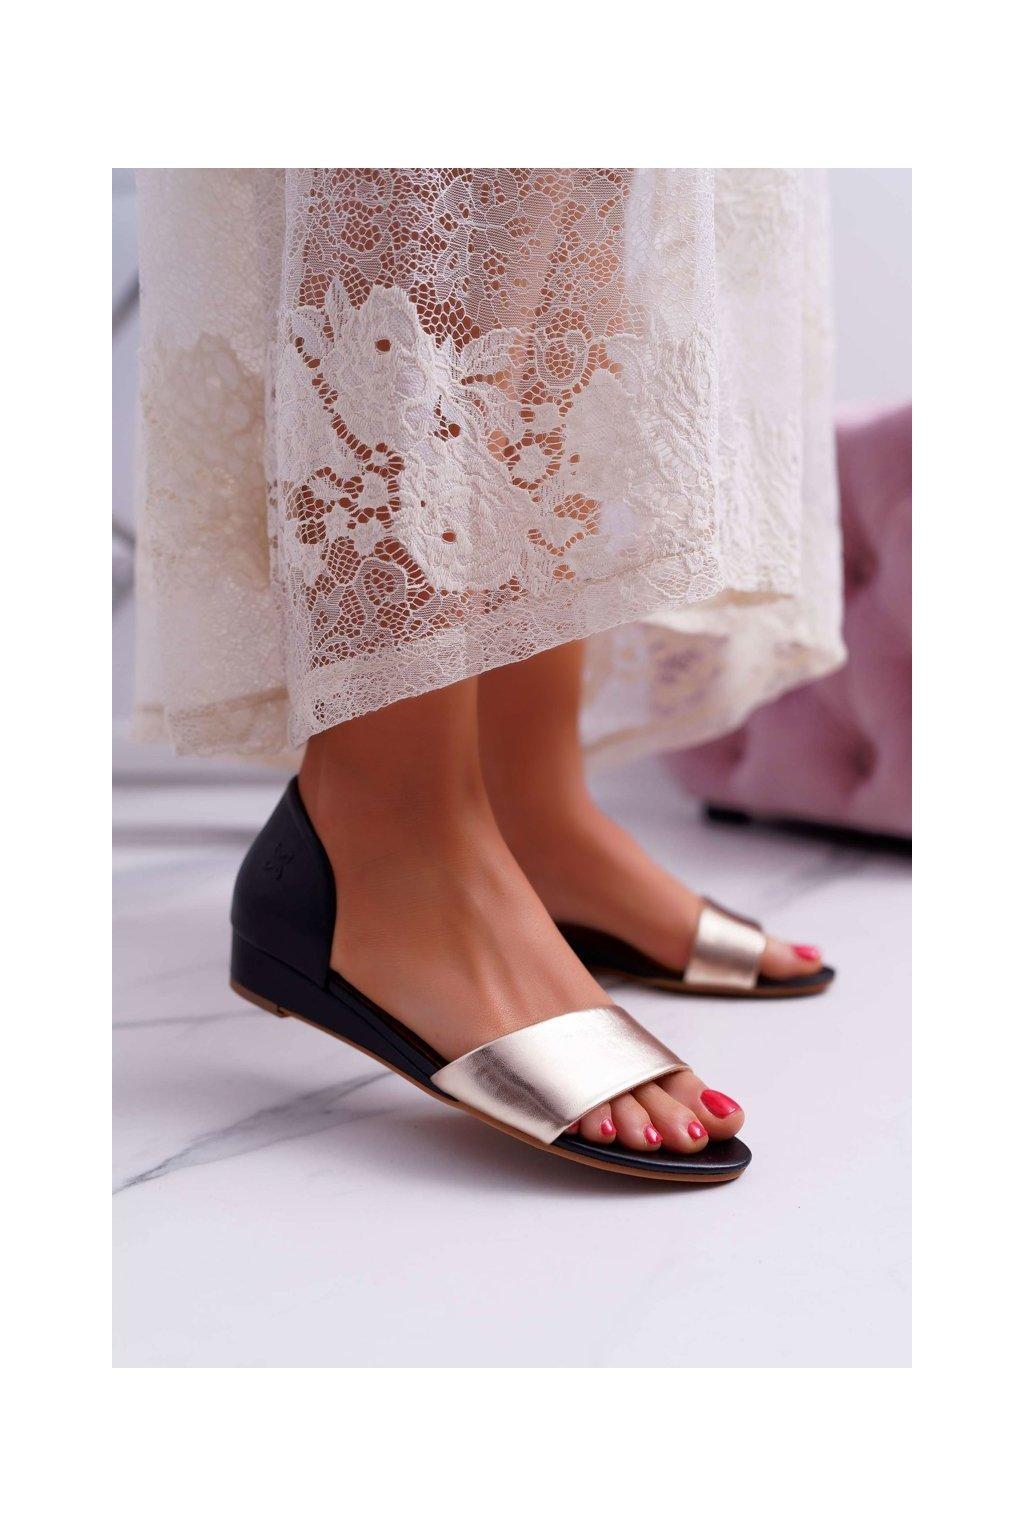 Dámske Sandále Majka Kožené čierne Zlaté 1971 Nomara